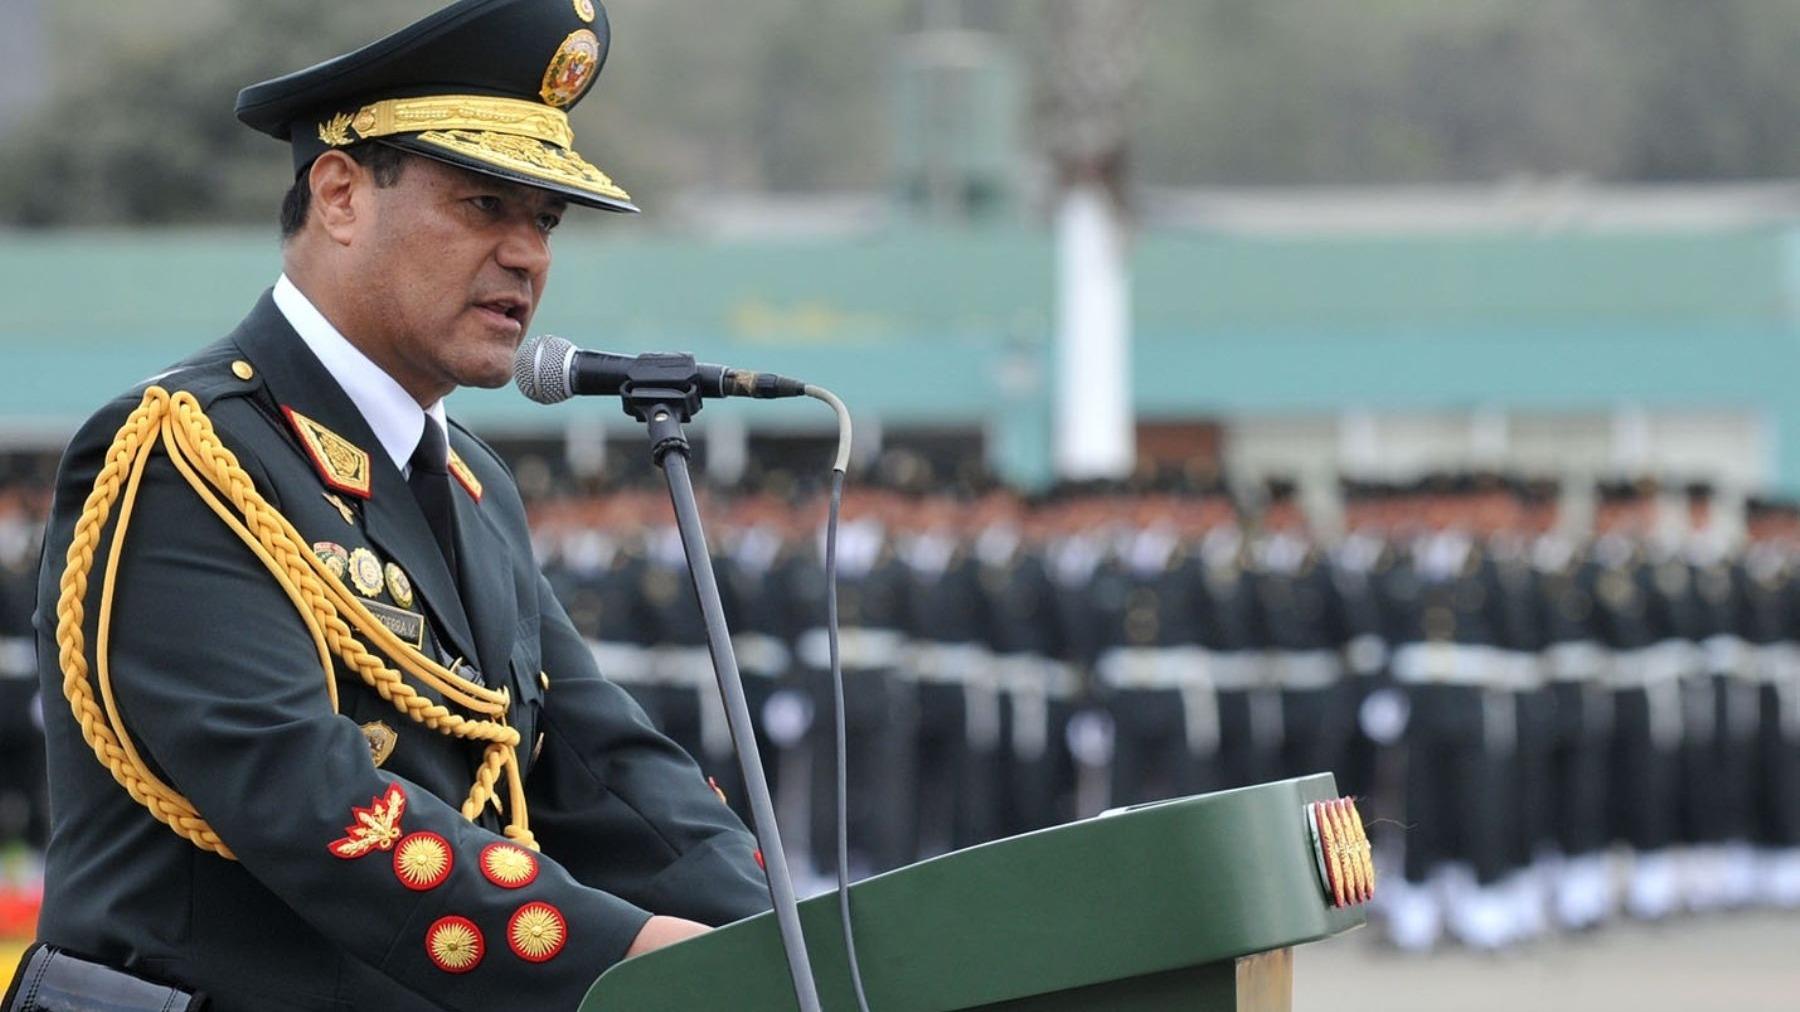 El megaoperativo se inició en la madrugada. El general ( r ) PNP Raúl Becerra fue uno de los detenidos.